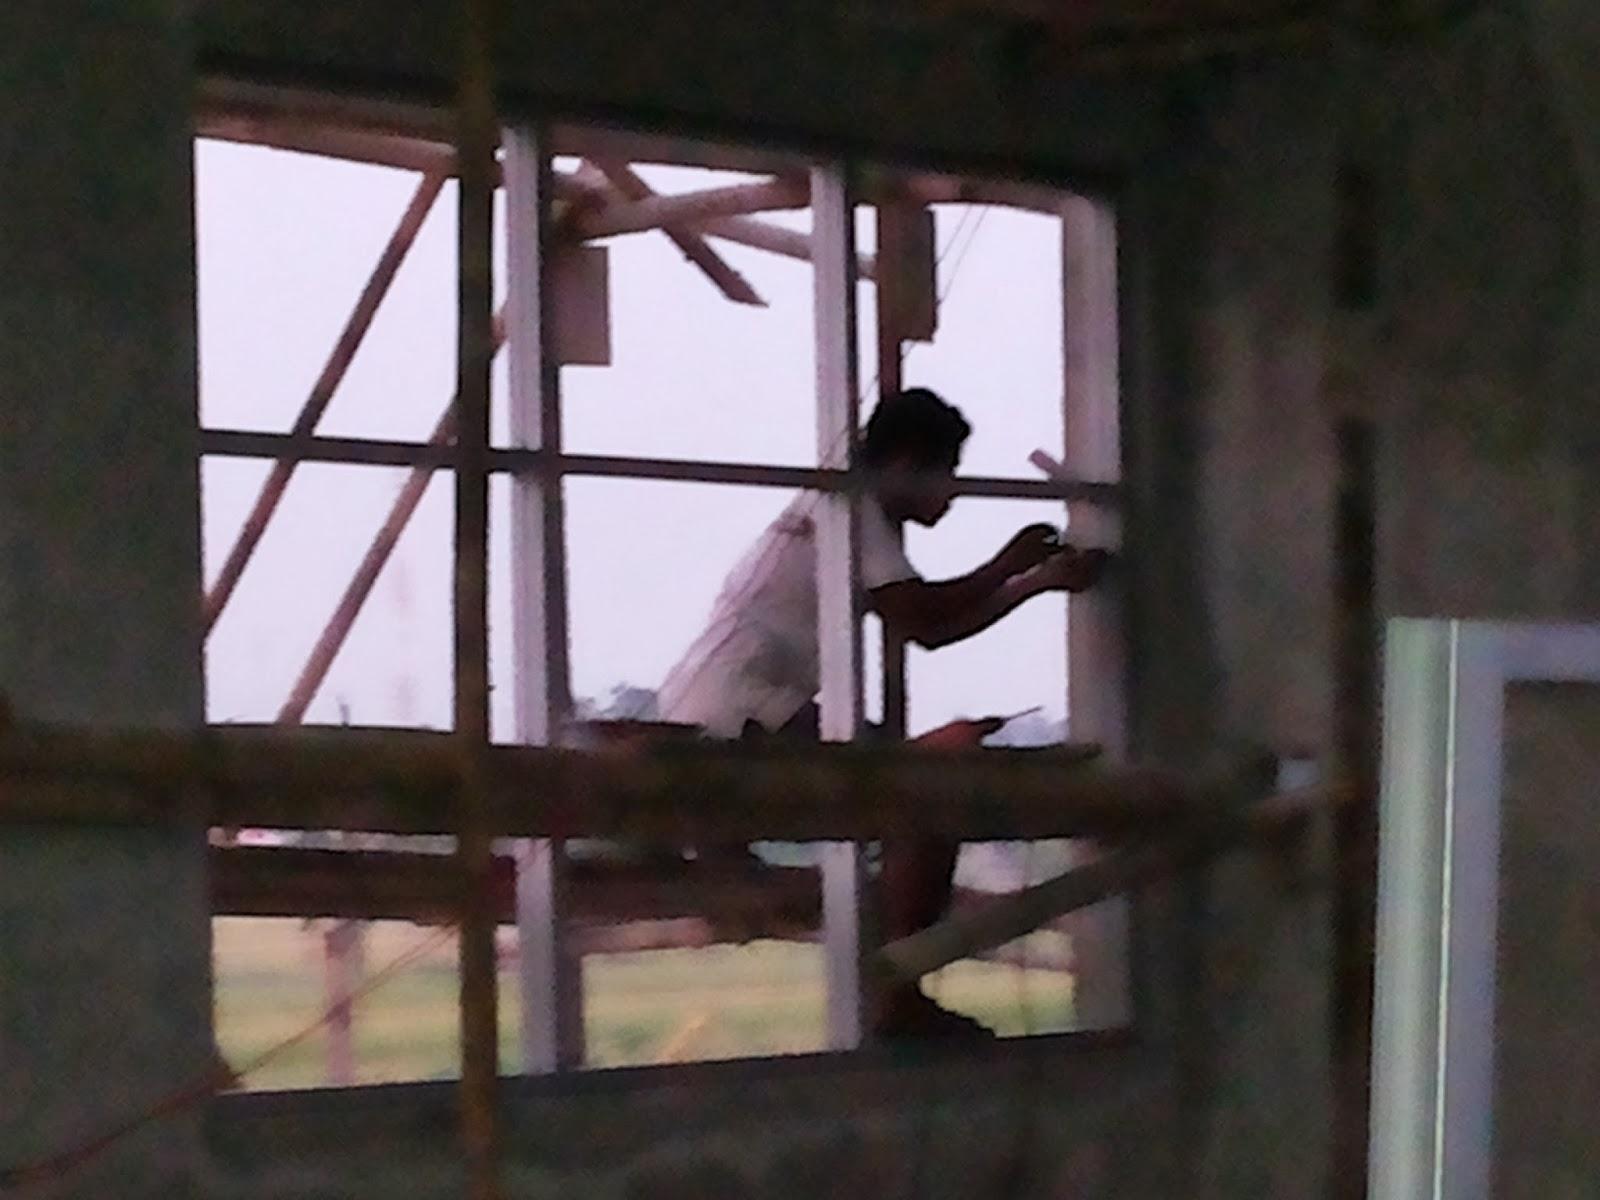 setelah proses perakitan selesai, proses selanjutnya dengan pemmasangan di tembok.